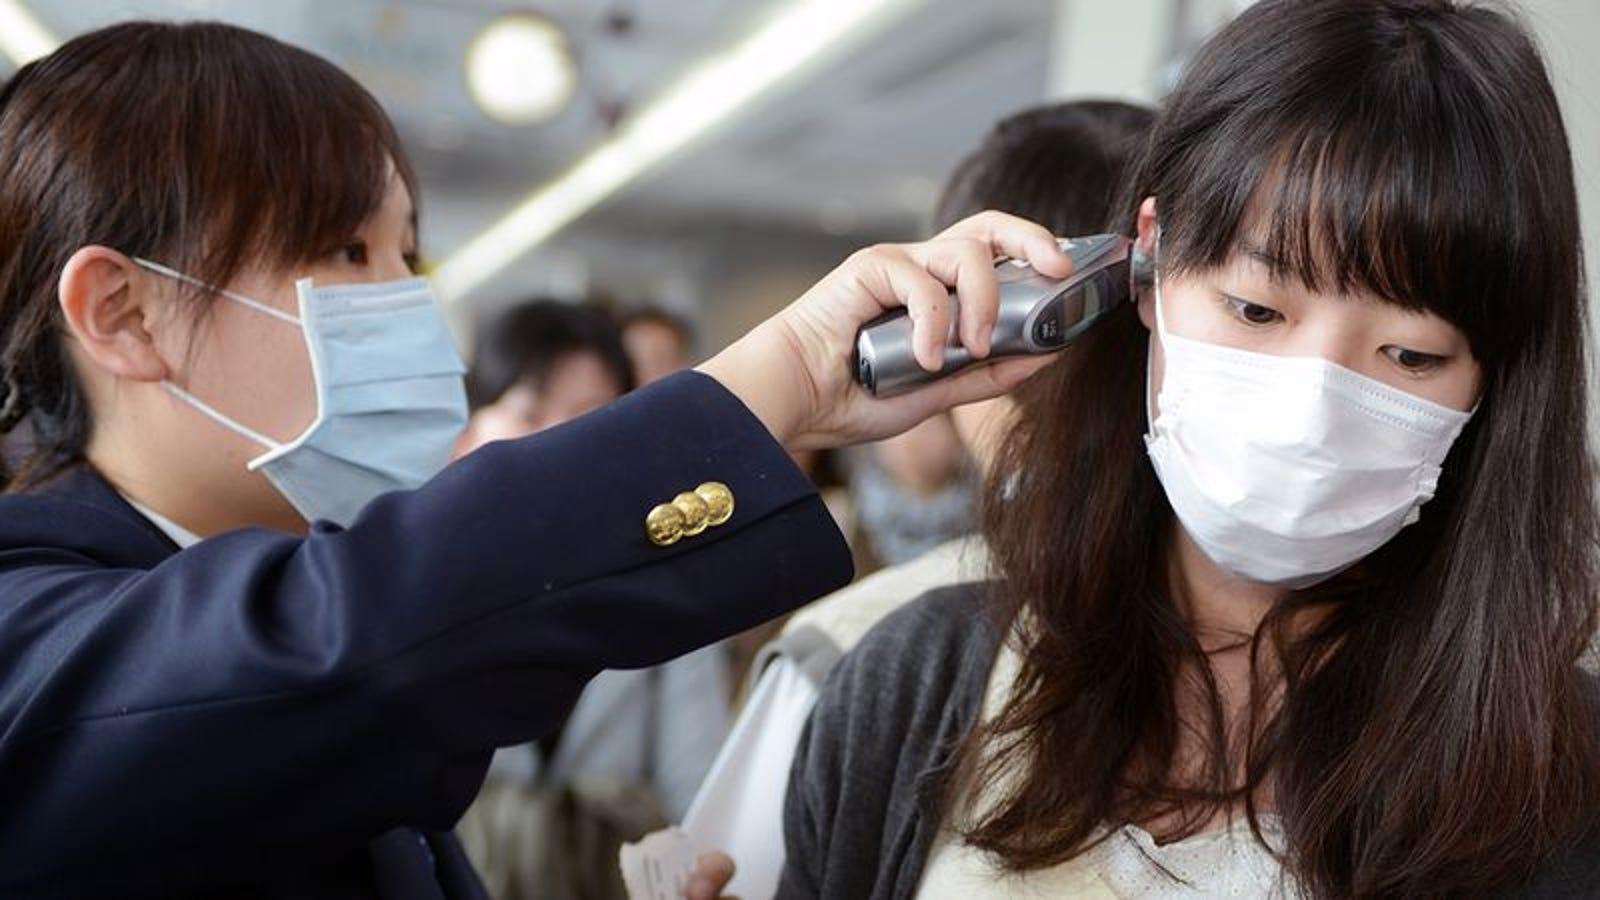 I Am Ashamed To Admit That I Was Patient Zero For Swine Flu (By Santa Claus)